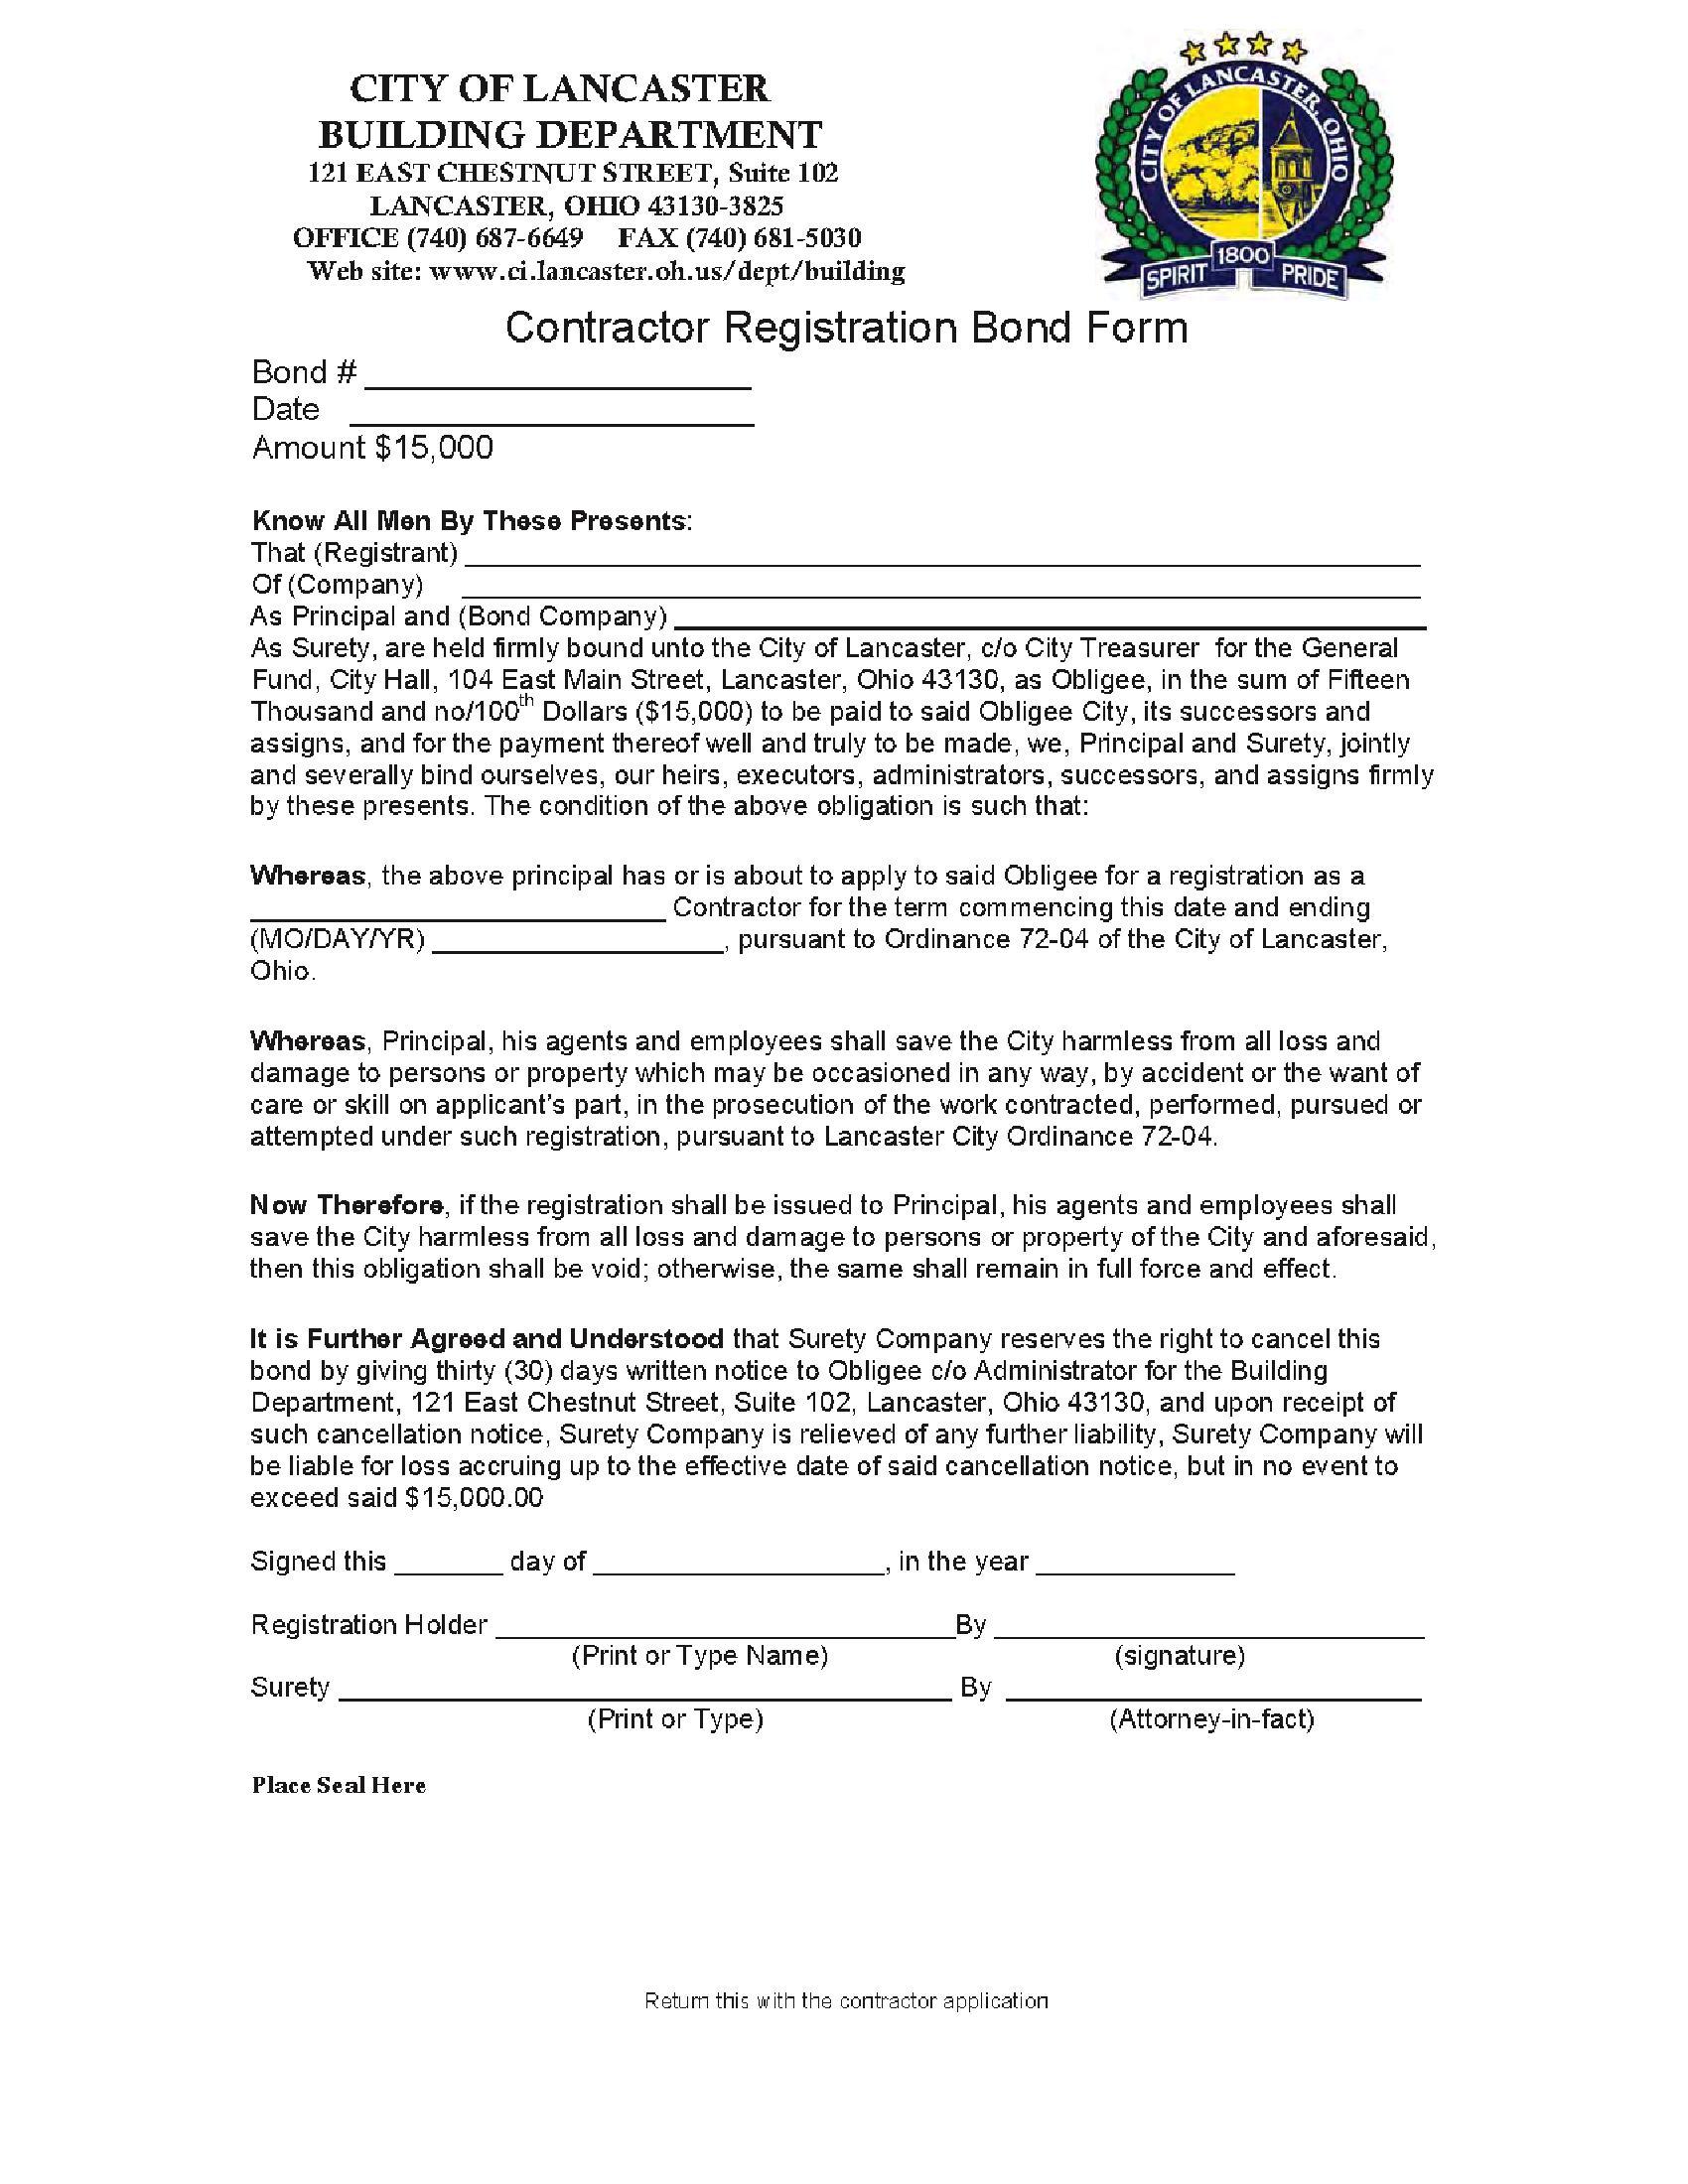 Lancaster - City Contractor Registration sample image